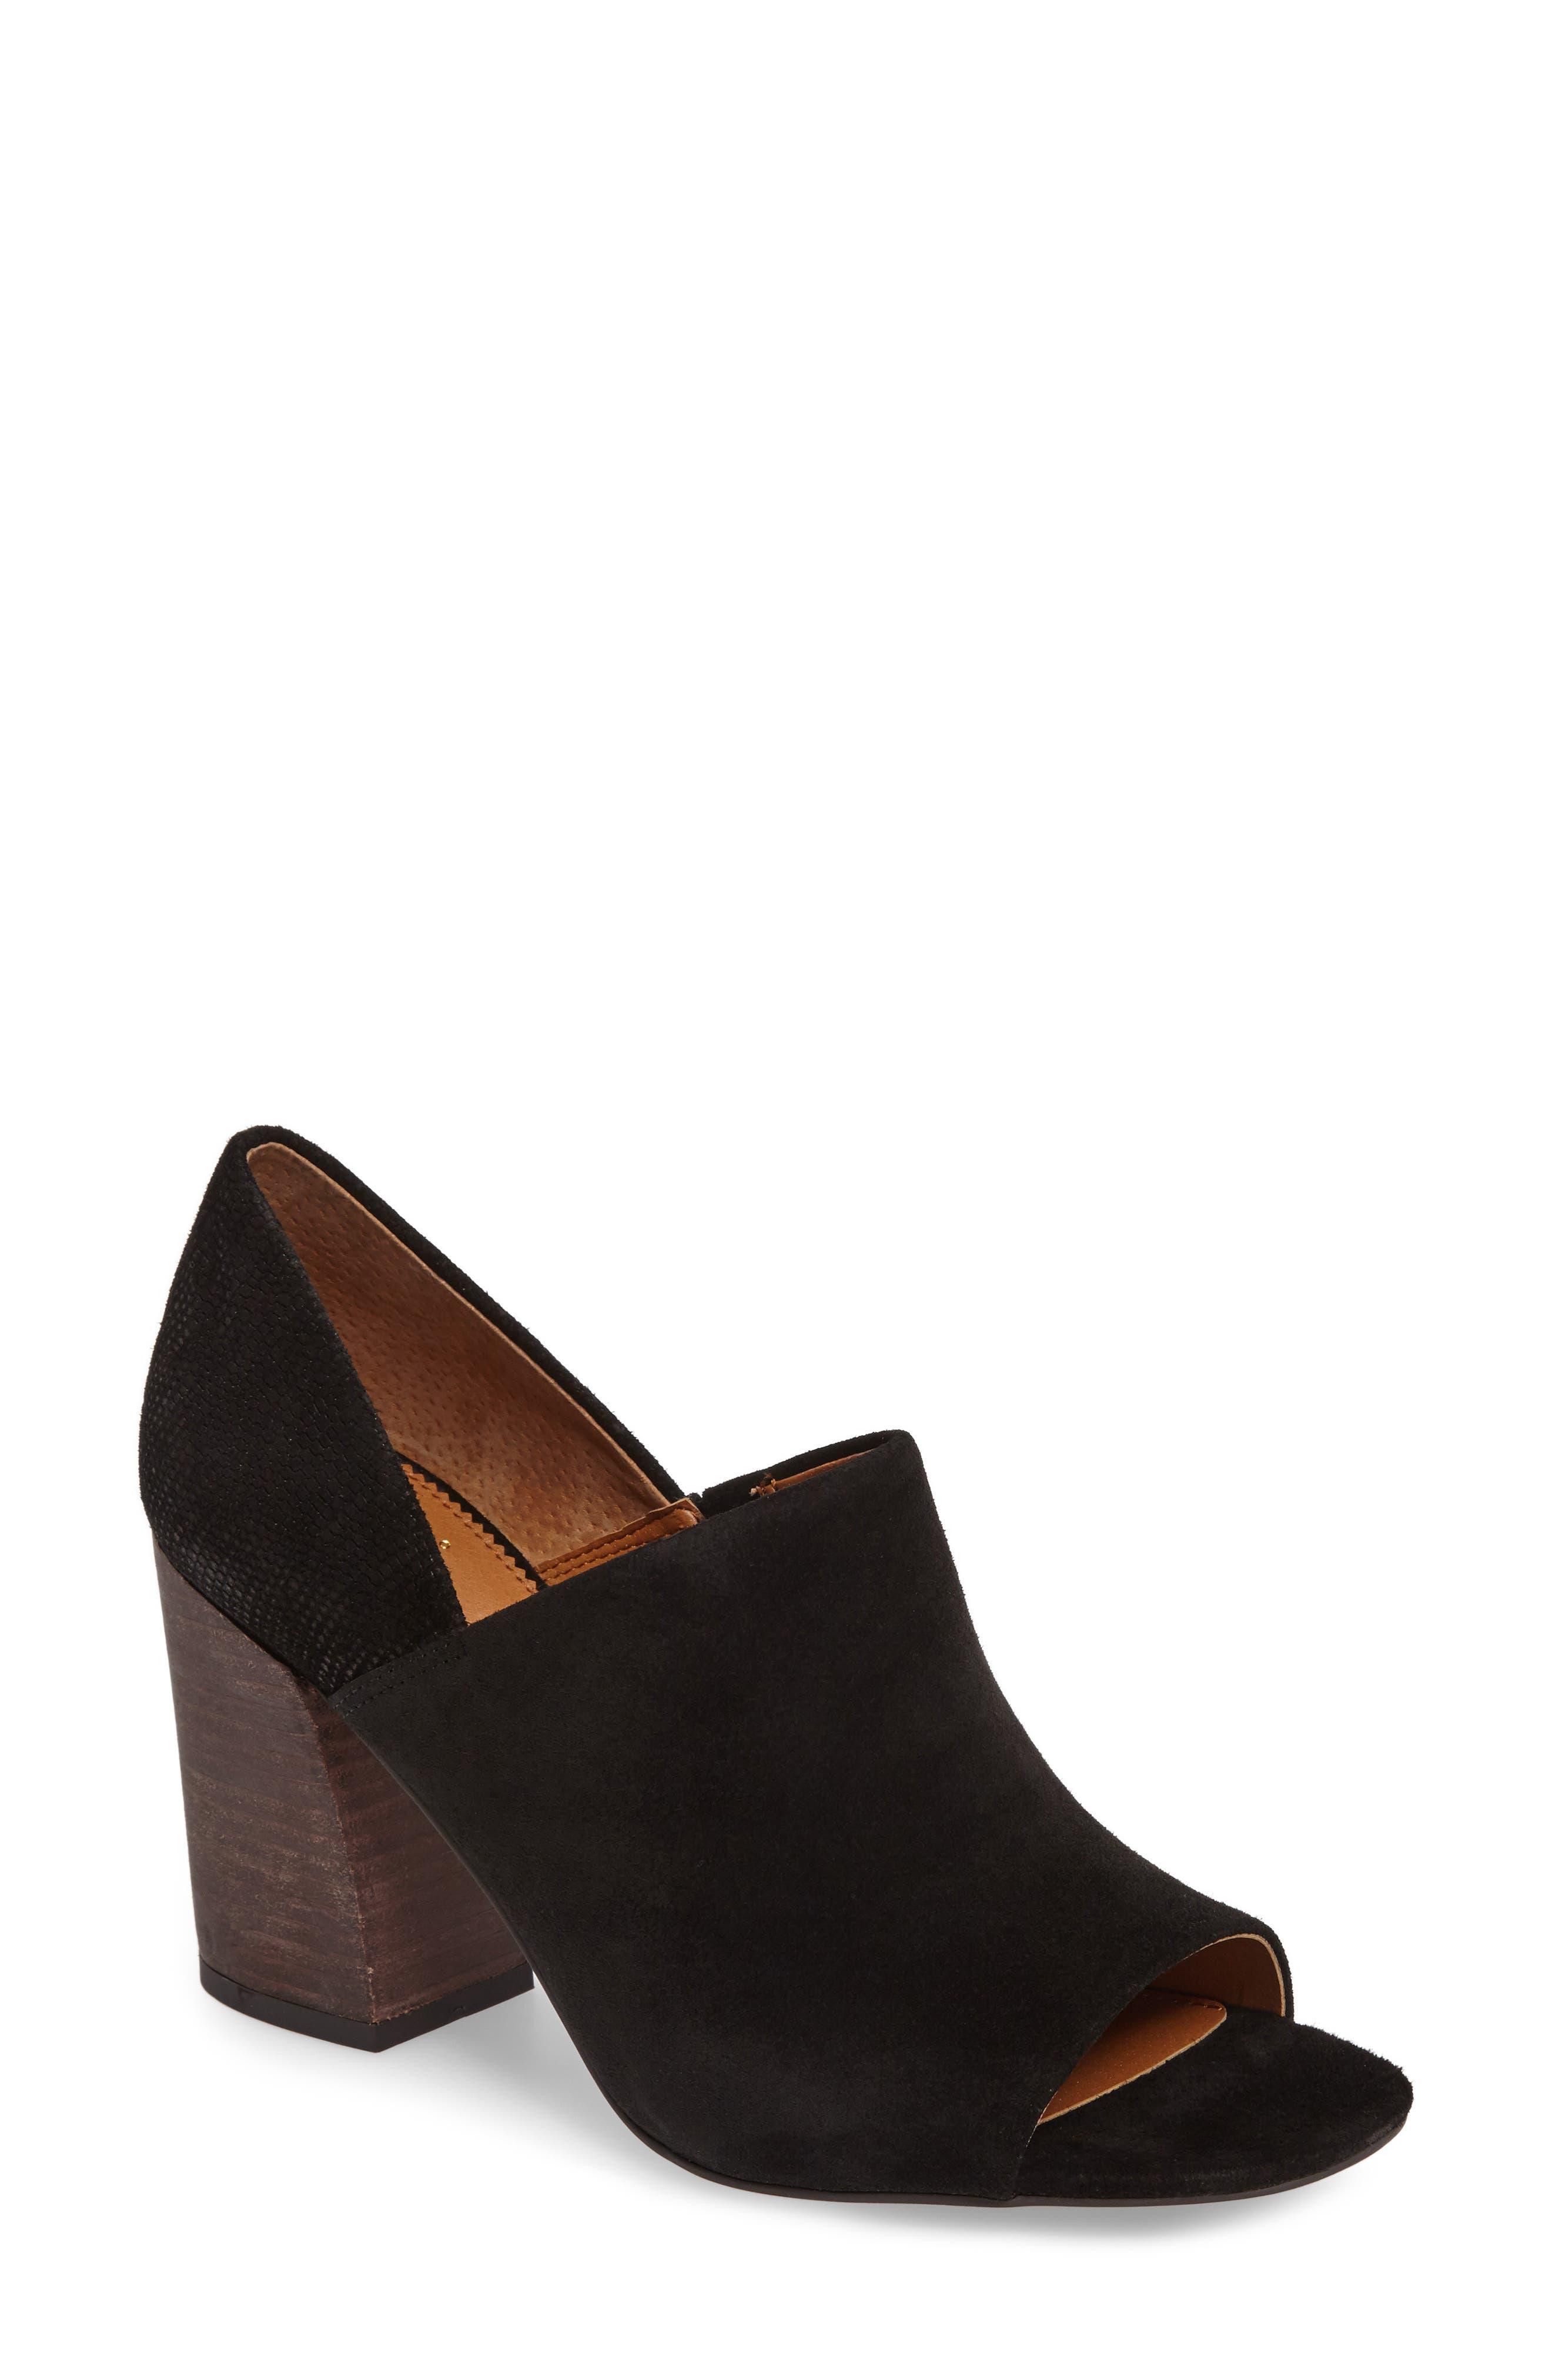 Ellison Block Heel Sandal,                         Main,                         color,